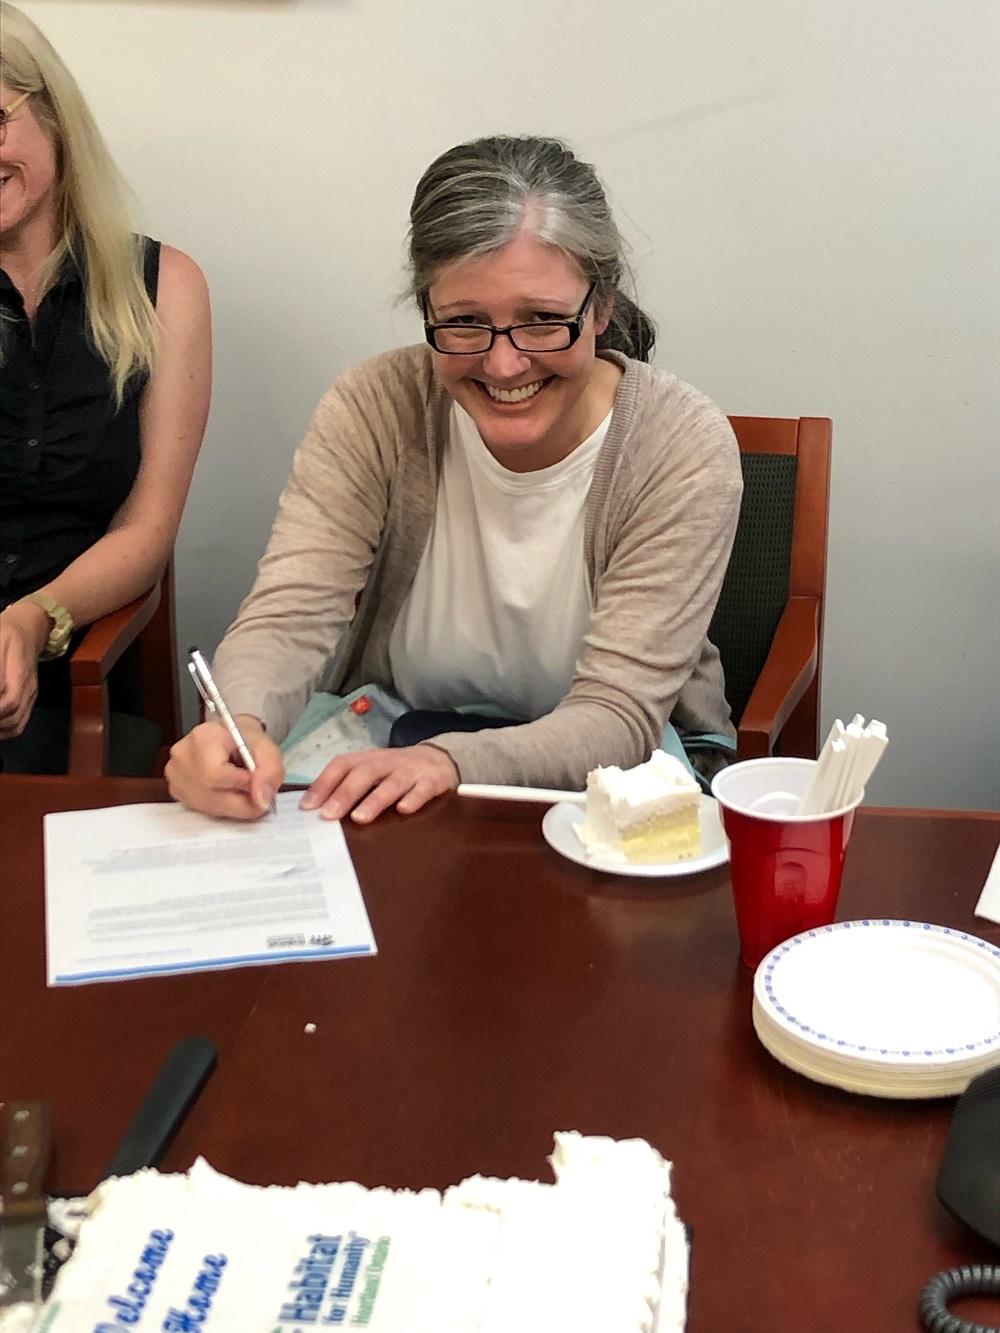 Kari signing partner letter